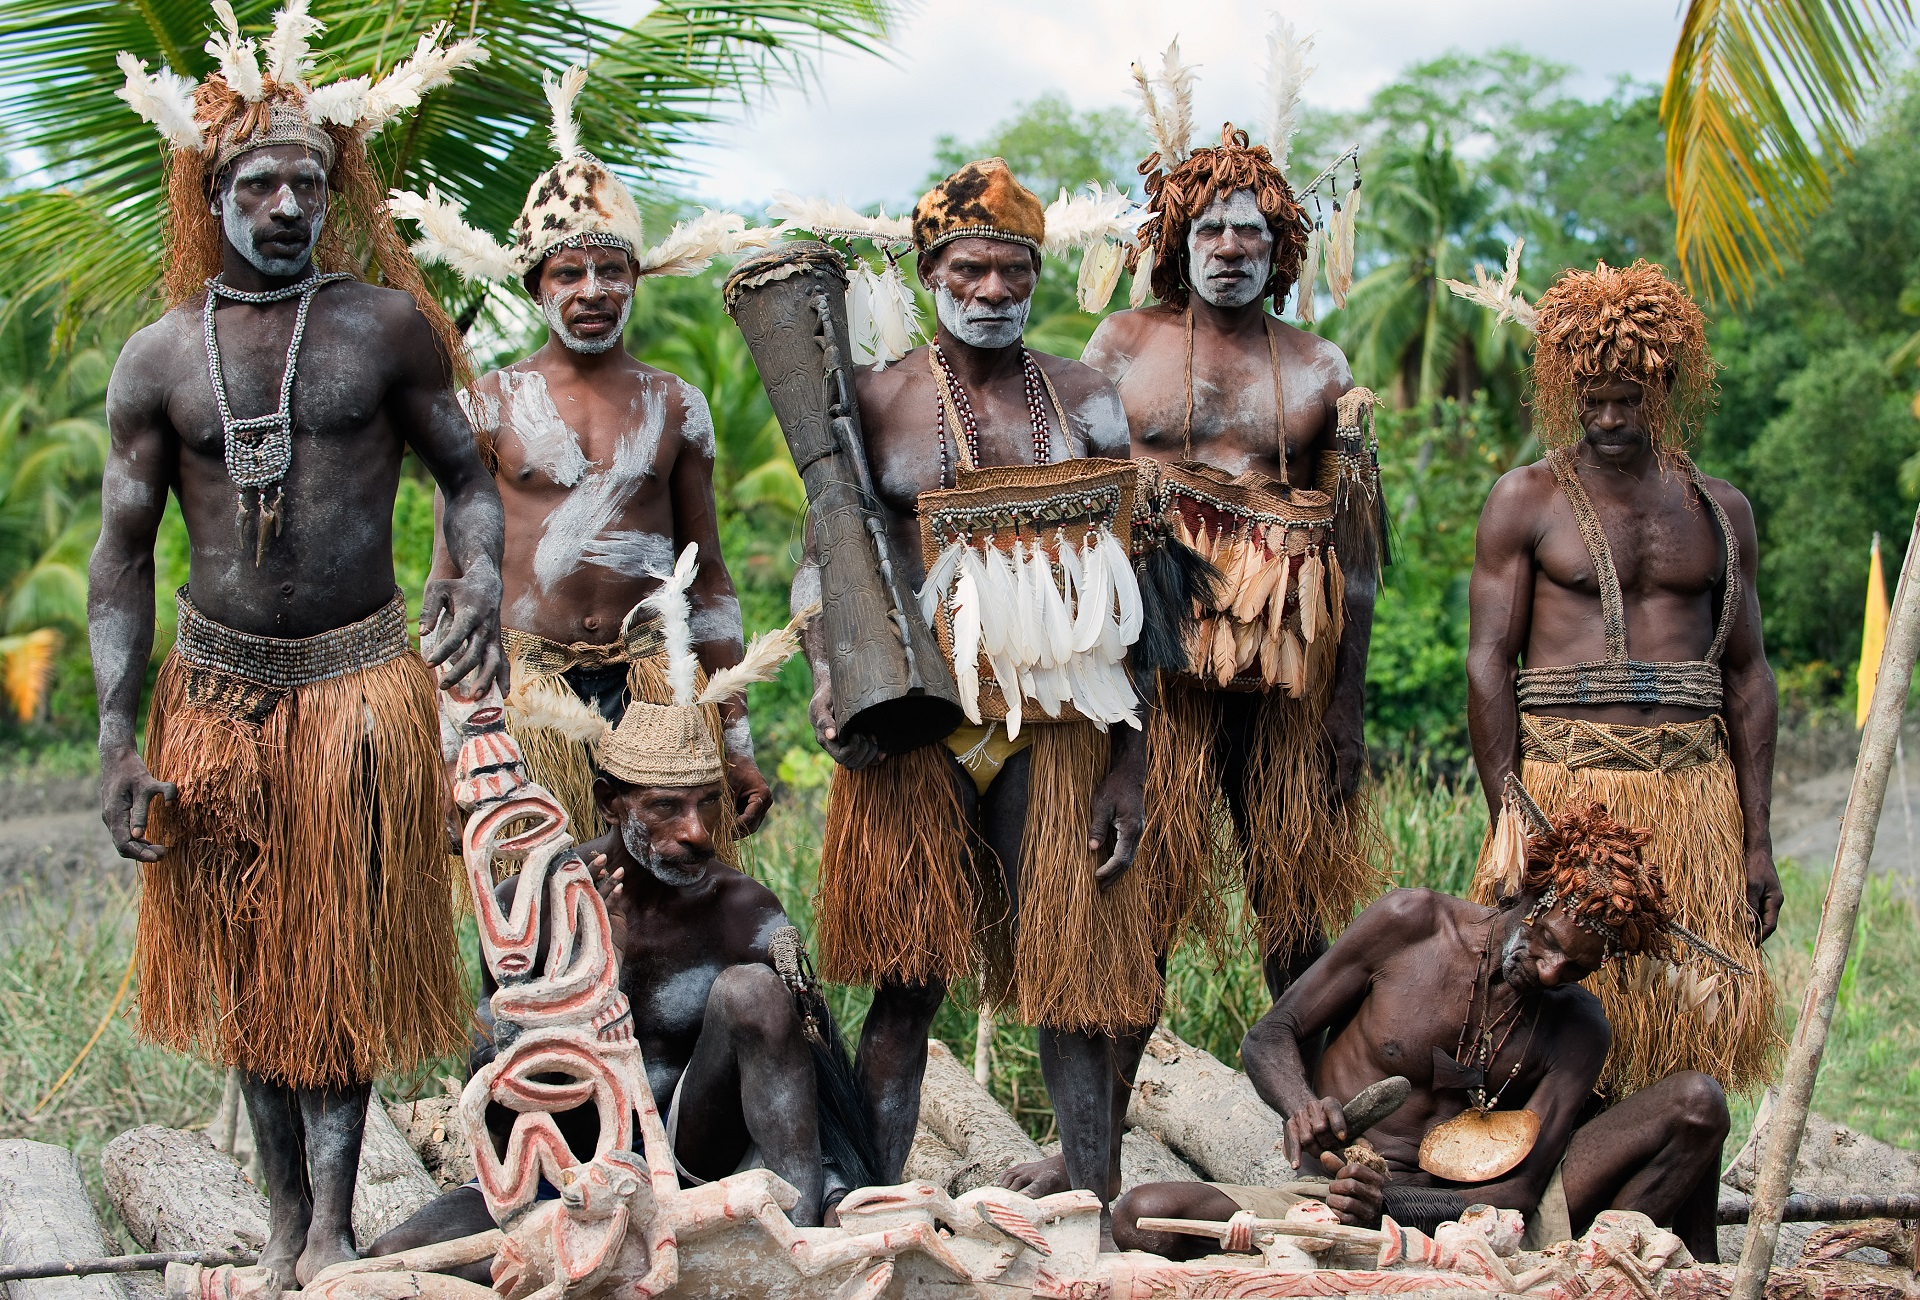 Ureinwohner von Papua-Neuguinea